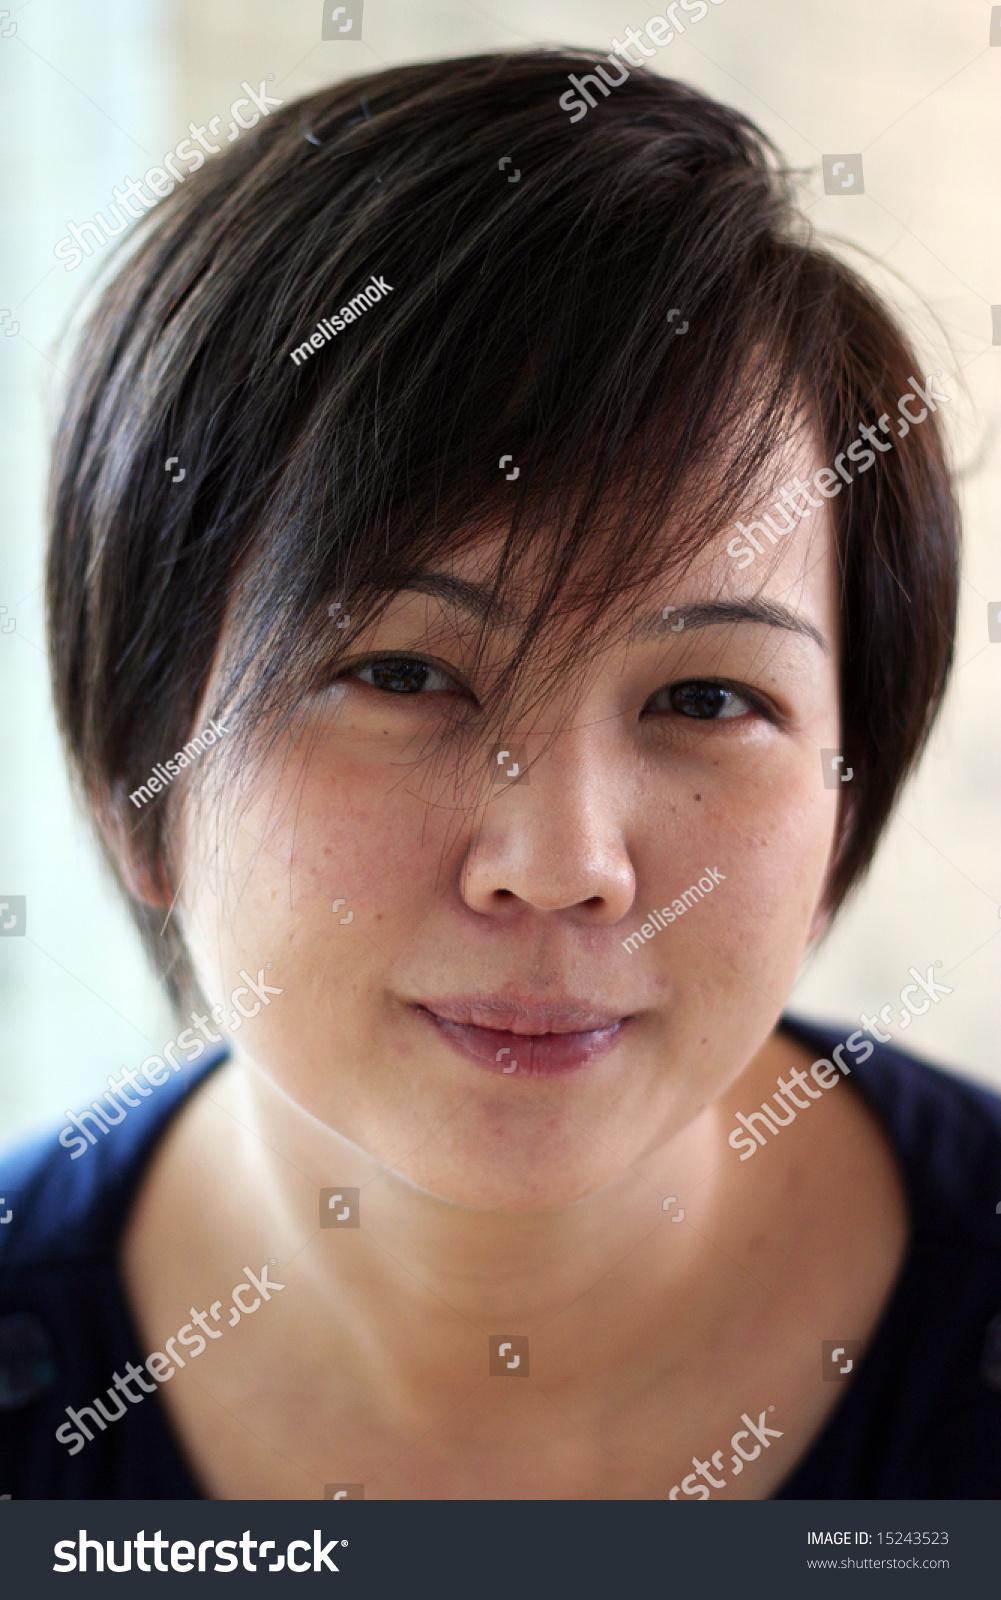 Asian Girl Short Hair Stock Photo Royalty Free 15243523 Shutterstock